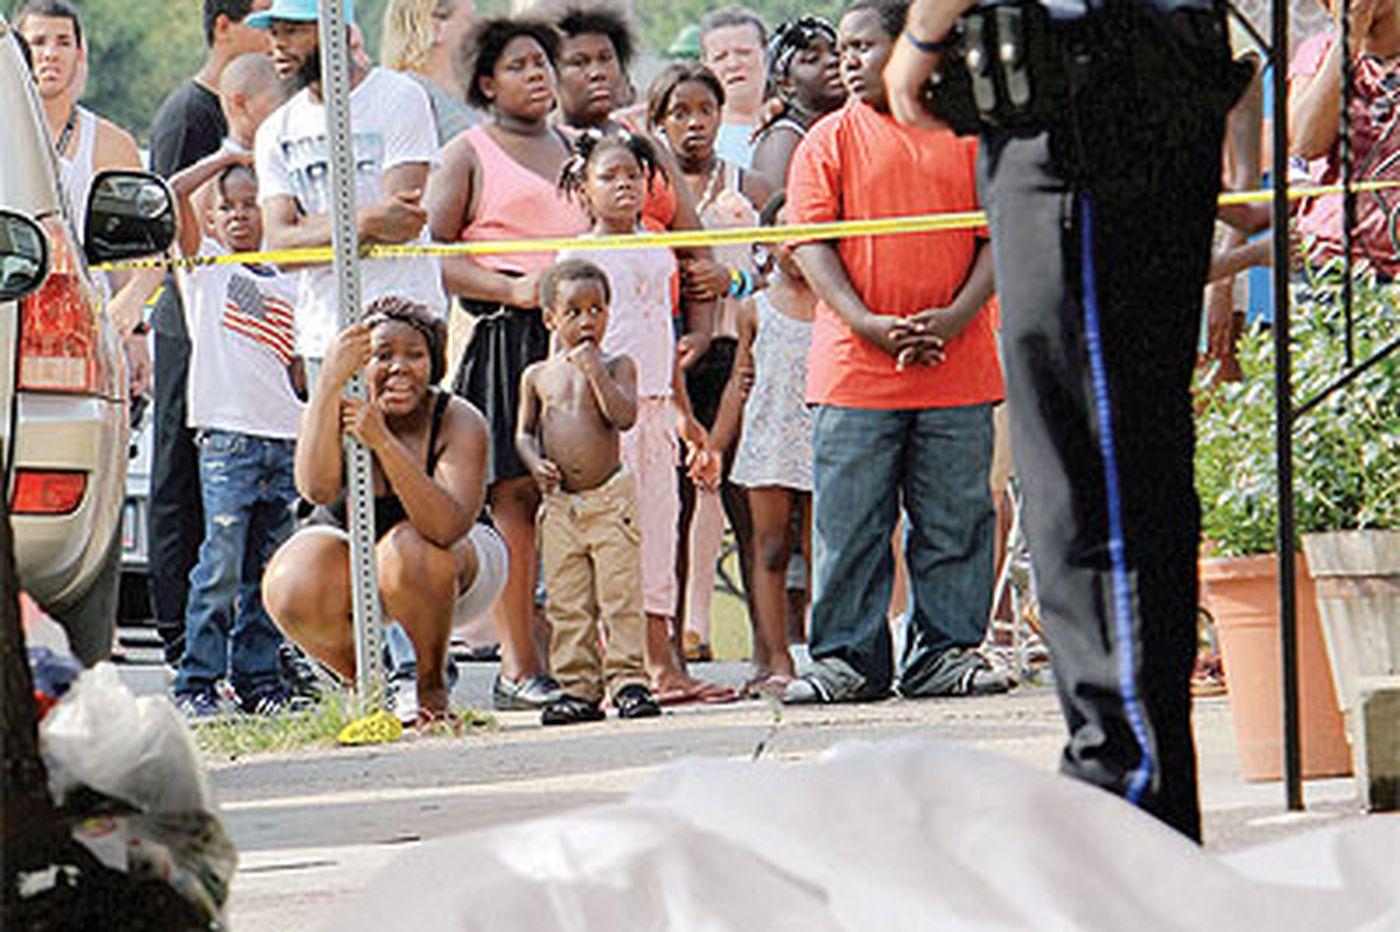 Kill-adelphia: Yet again, city tops list of homicide rates